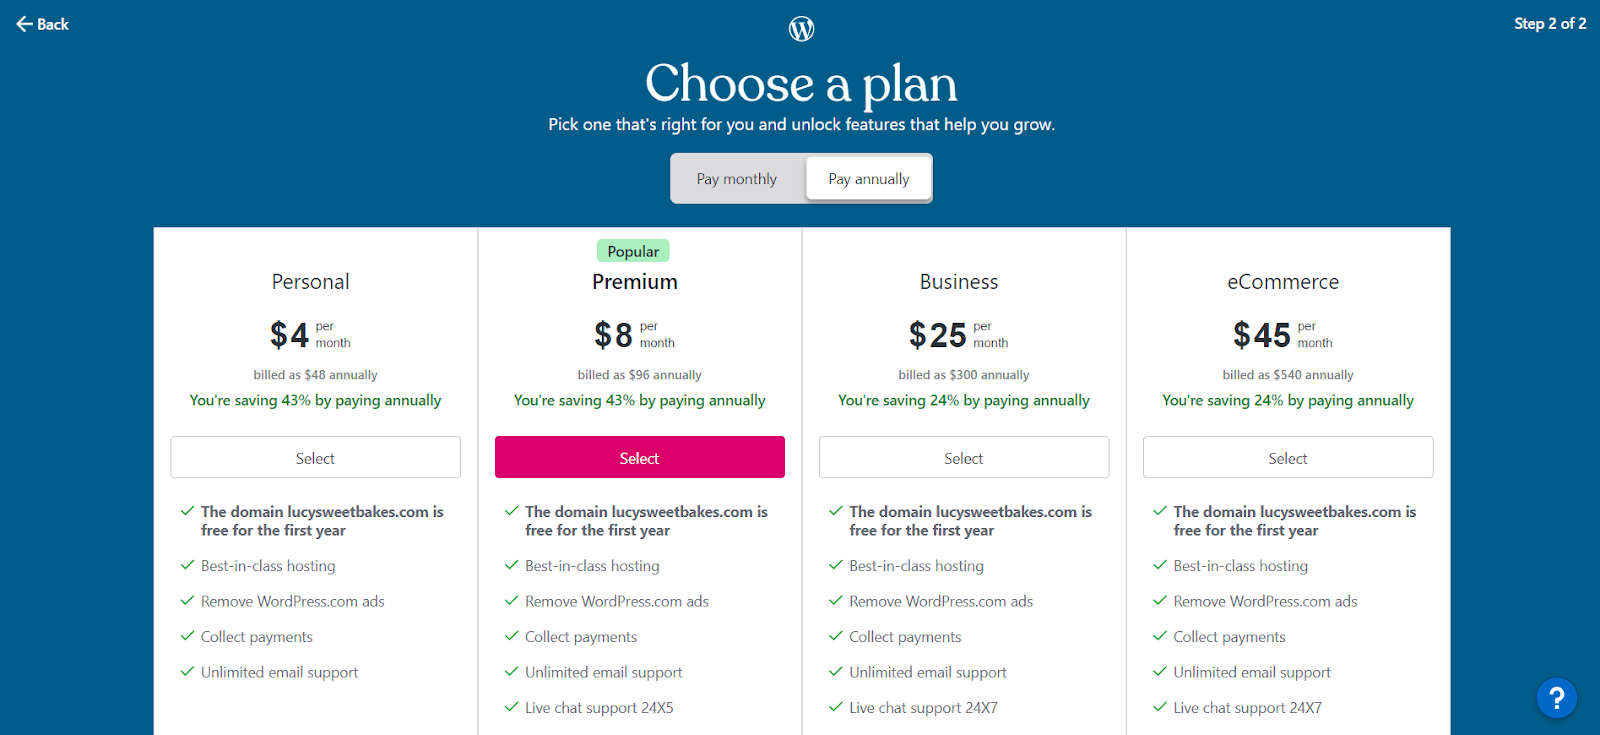 Choosing a plan for your WordPress.com website